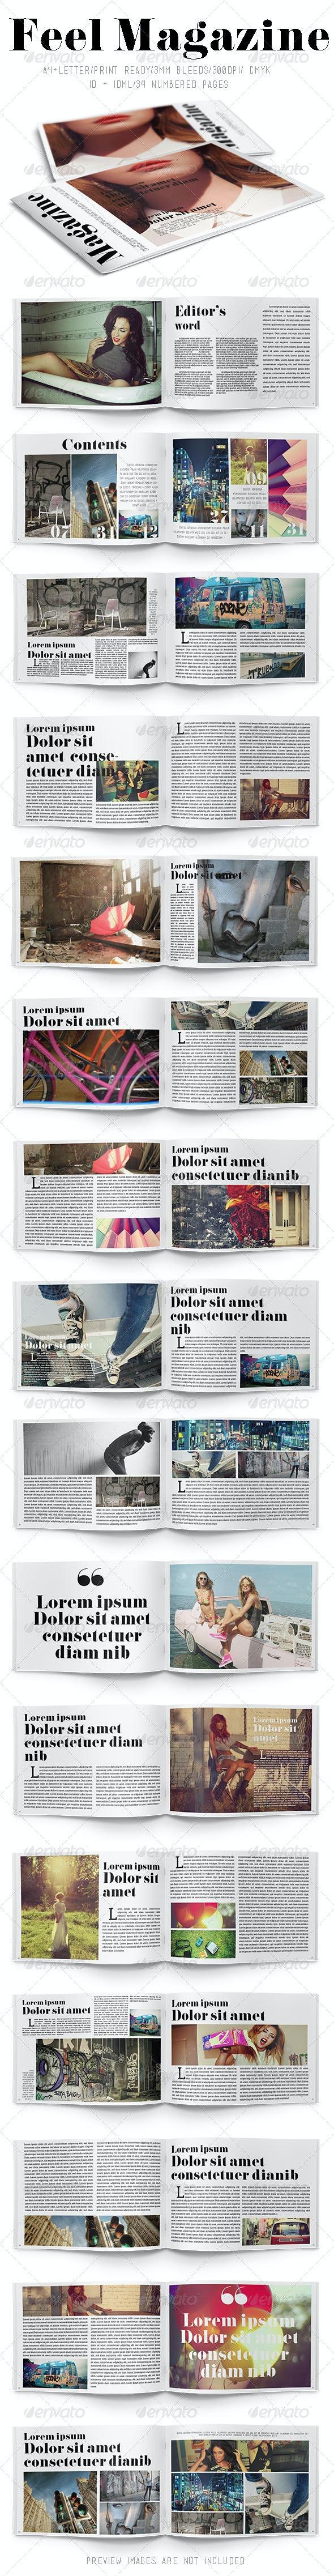 Feel Magazine - Magazines Print Templates